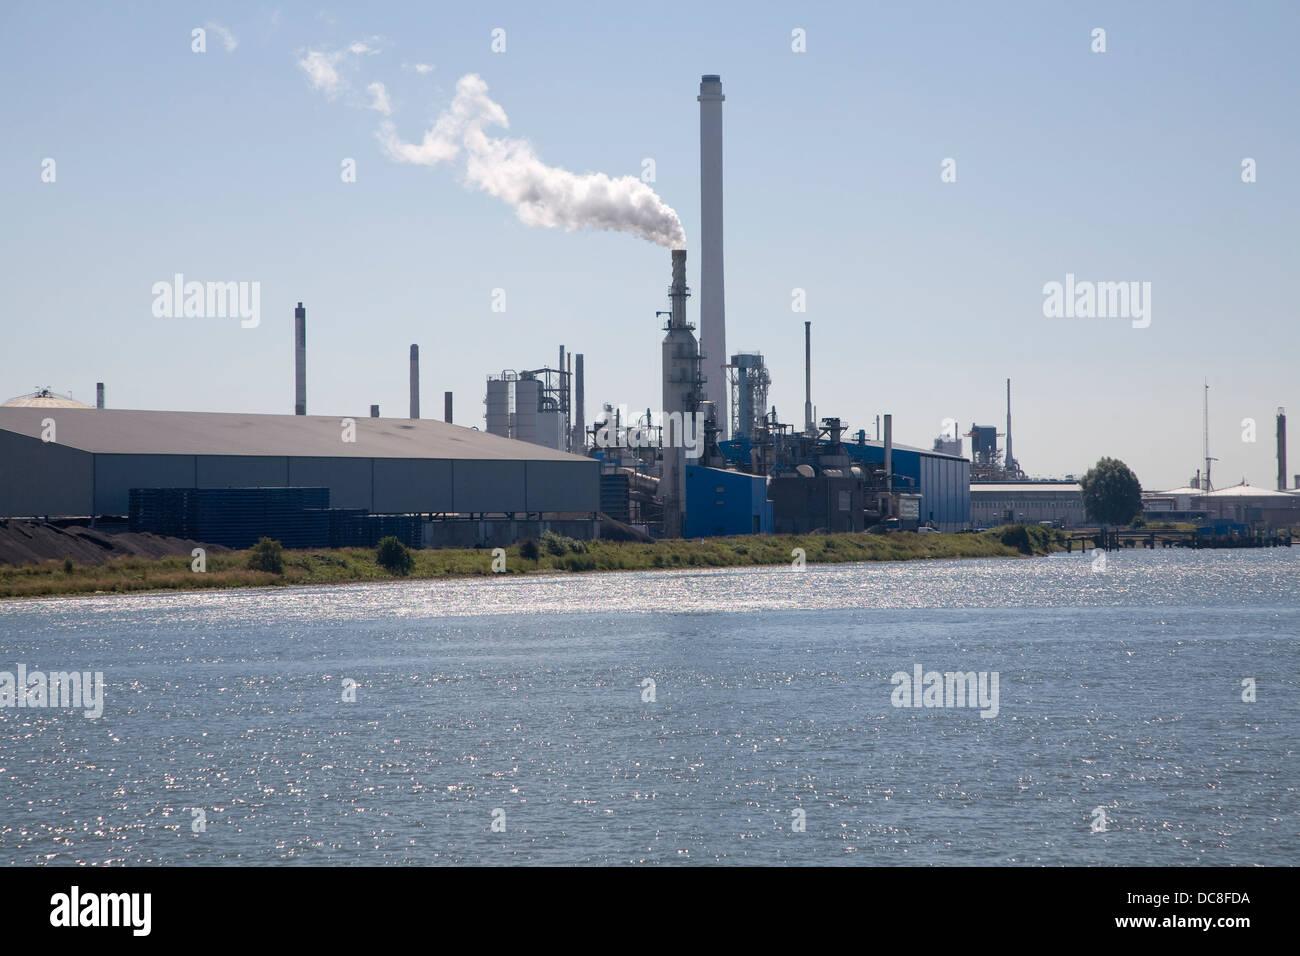 Chimneys heavy industry Port of Rotterdam, Netherlands - Stock Image